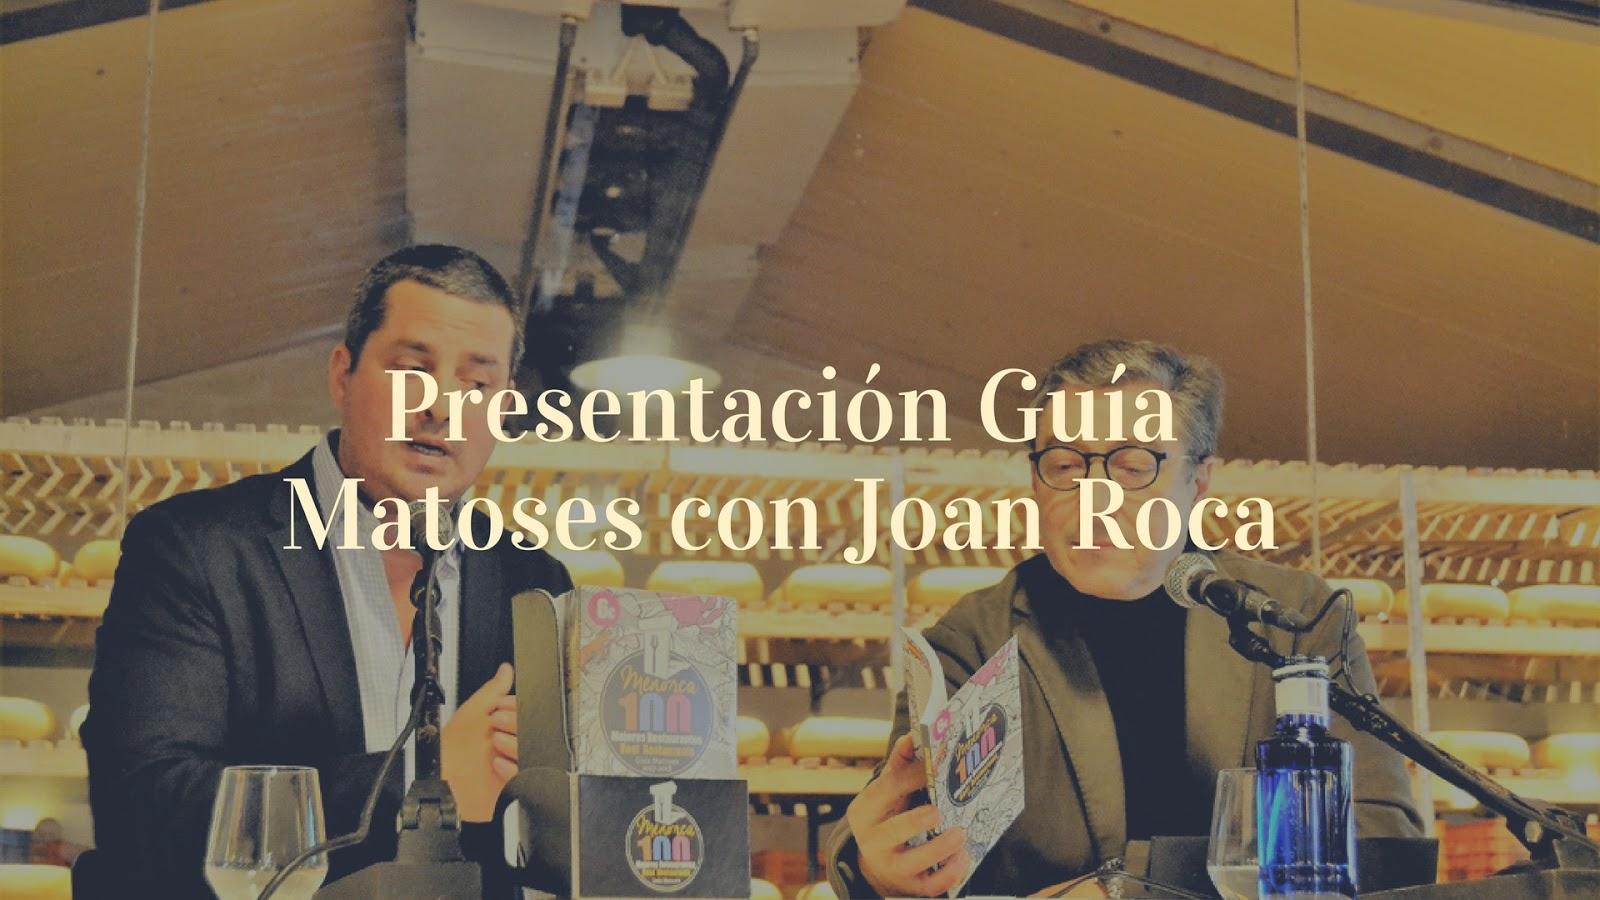 http://www.nikavintage.com/2017/11/presentacion-guia-matoses-joan-roca.html